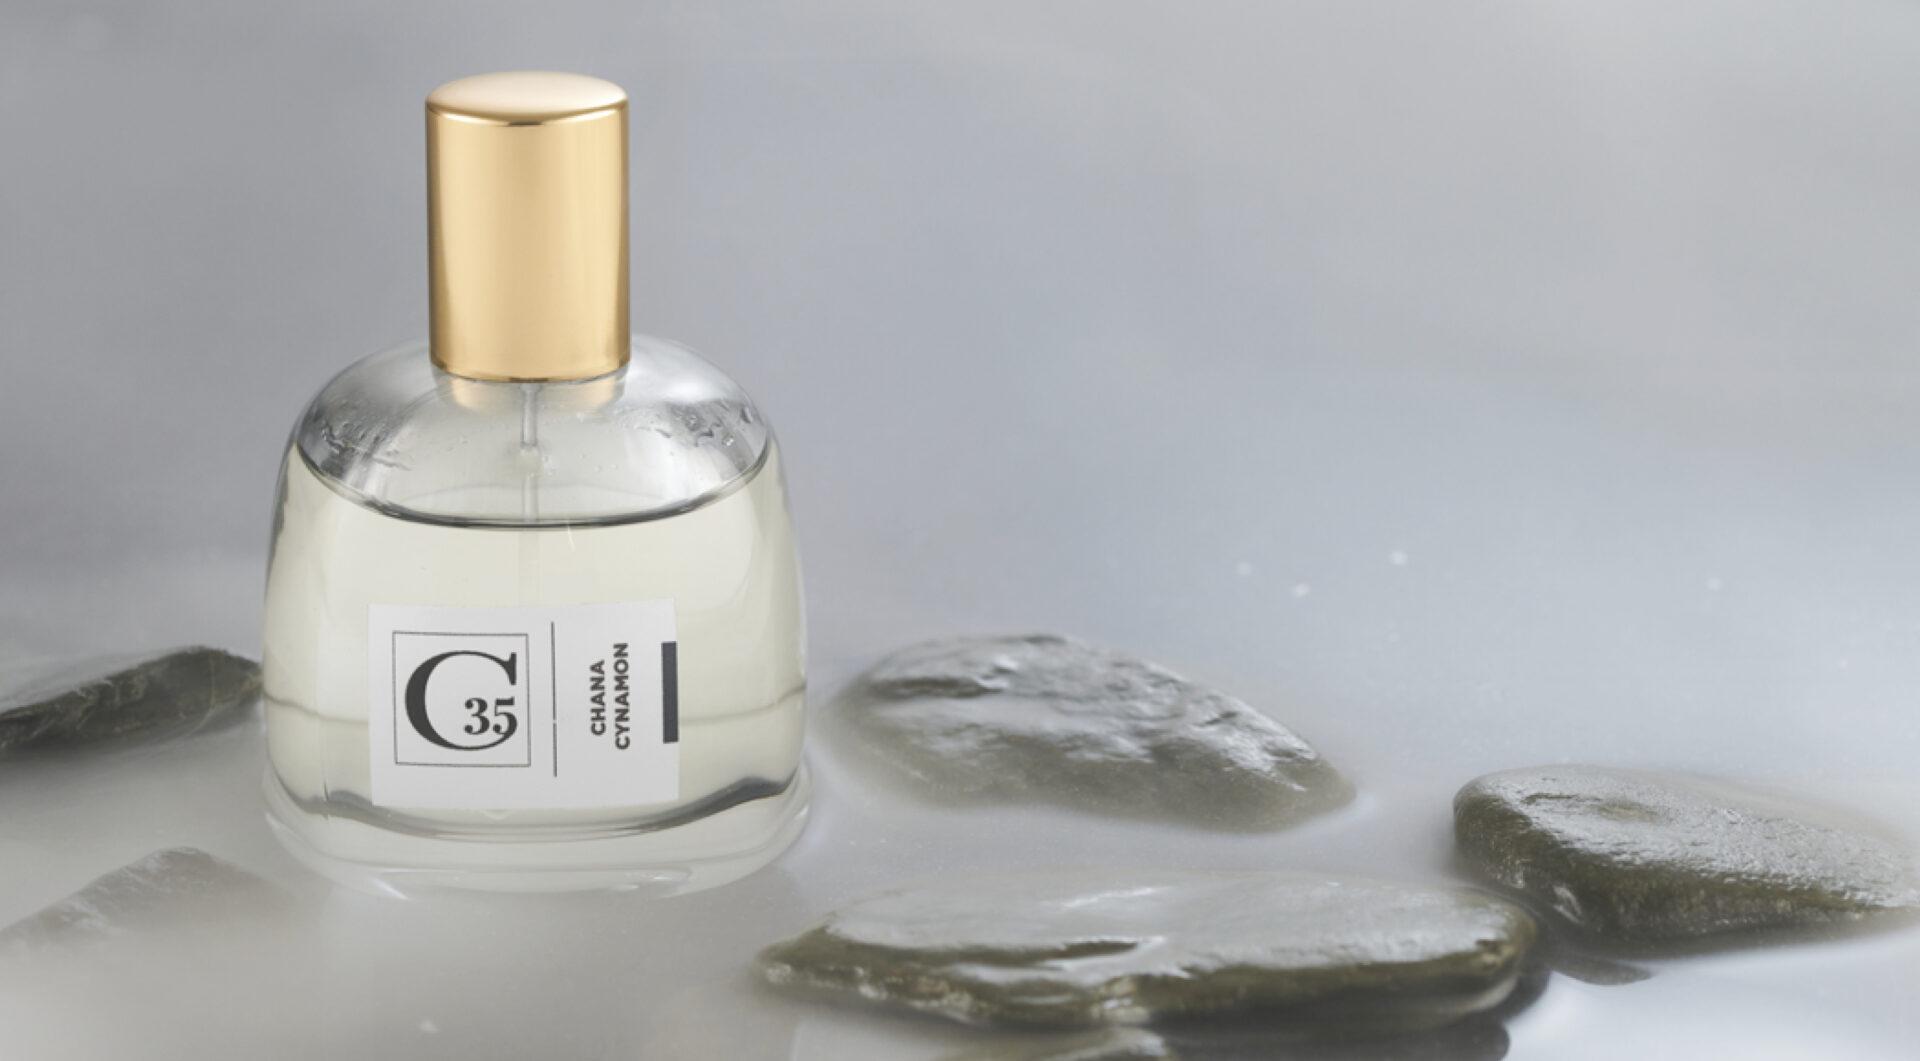 Un parfum Made in Normandie, finaliste de Beautyworld Middle East 2021 !